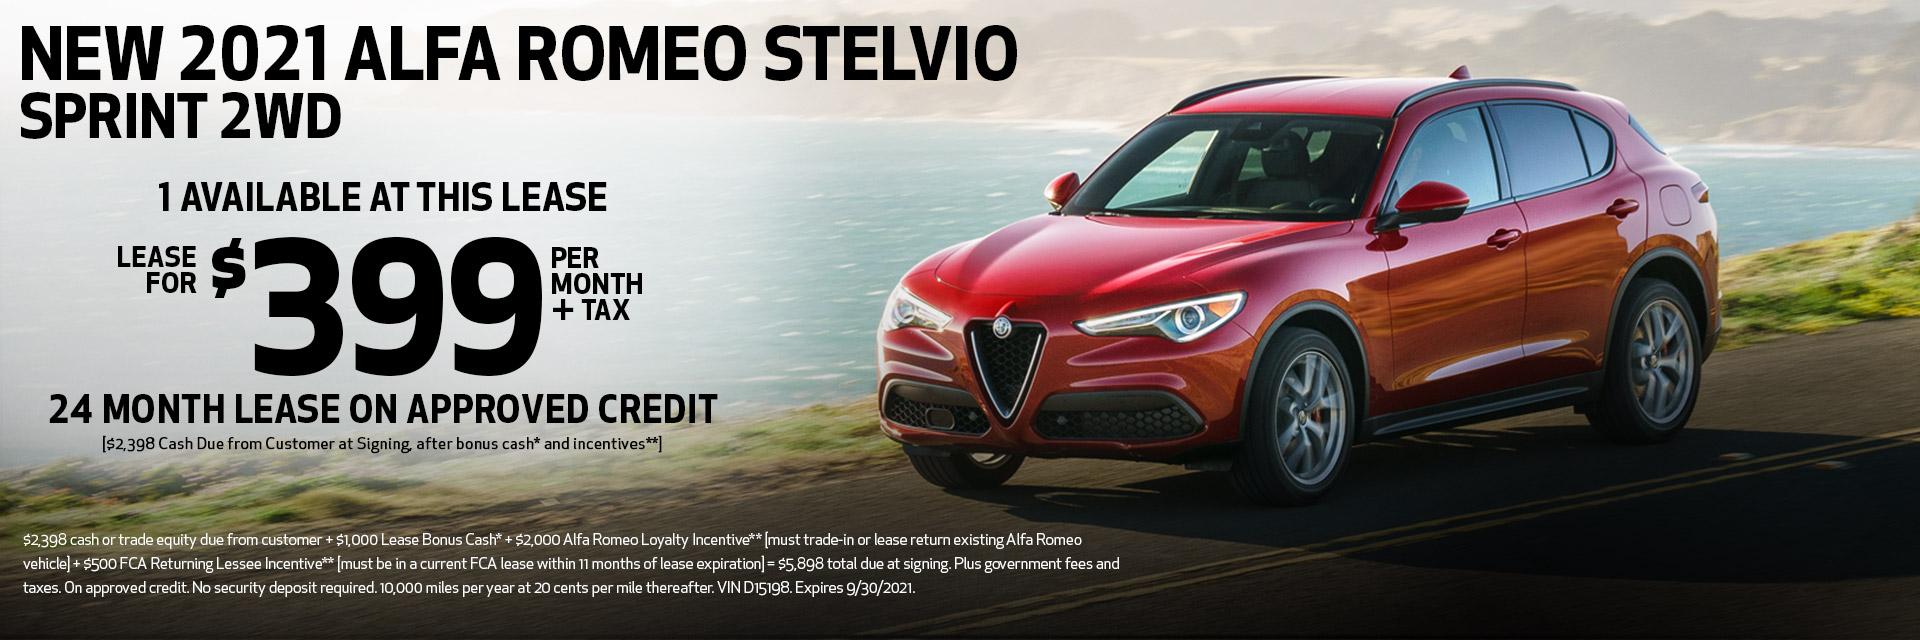 New 2021 Alfa Romeo Stelvio Sprint 2WD